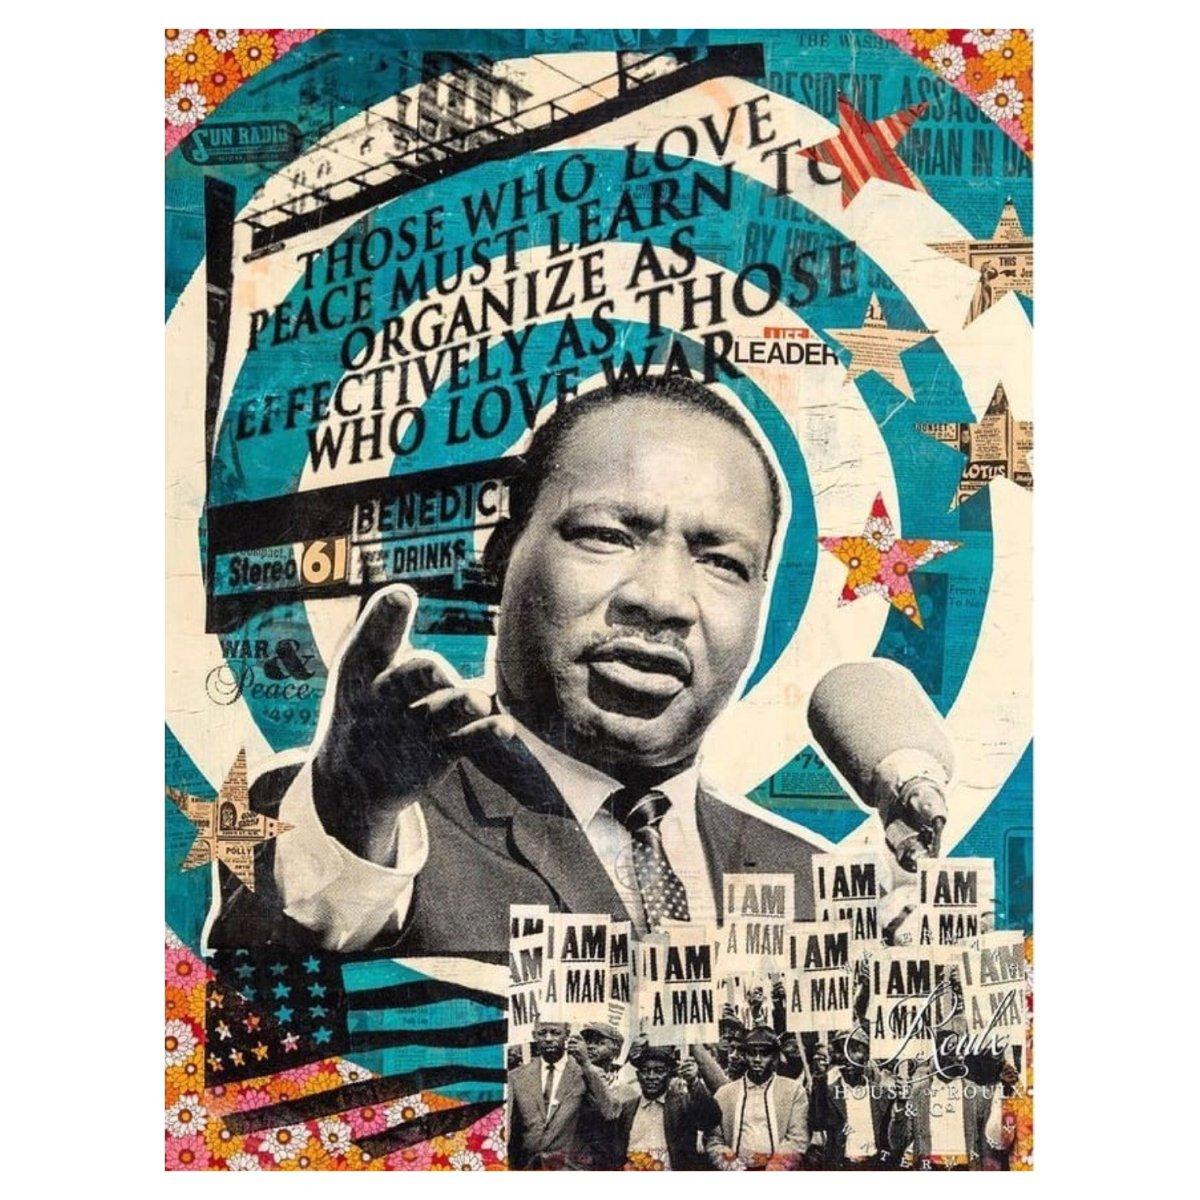 #MLK #HappyBirthdayMLK https://t.co/kKJrCp6aNm